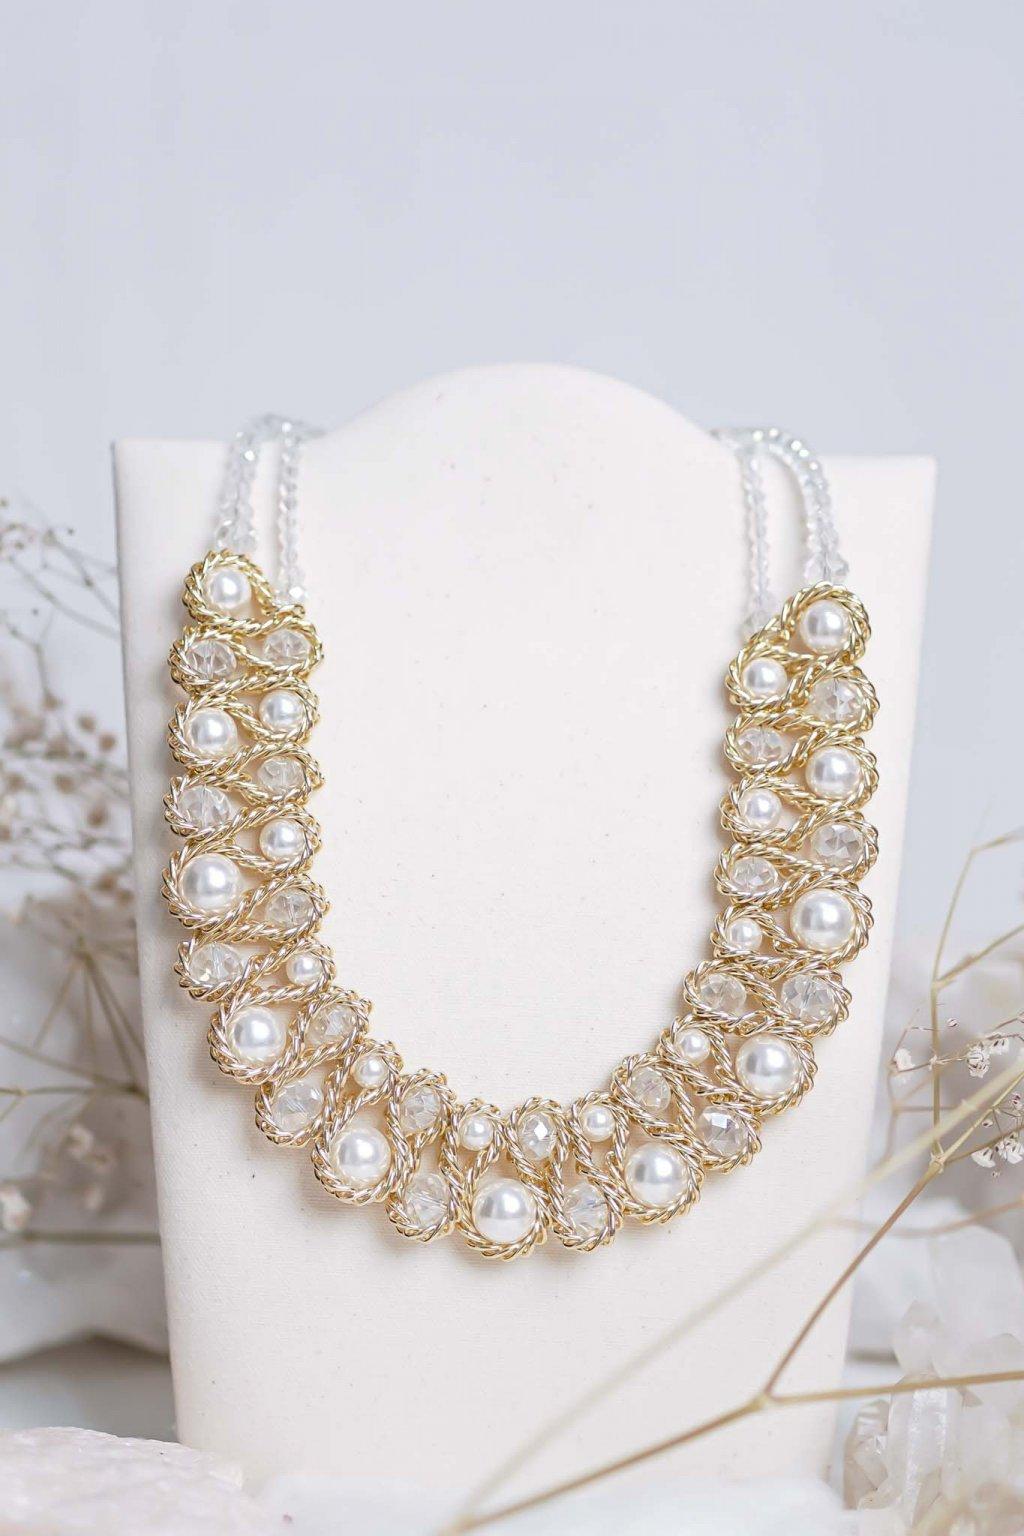 náhrdelník, šperk, spoločenská náhrdelník, náhrdelník na bežný deň, výrazný náhrdelník, jemný náhrdelník, šperky, náhrdelník na ples, svadbu, stužkovú 26